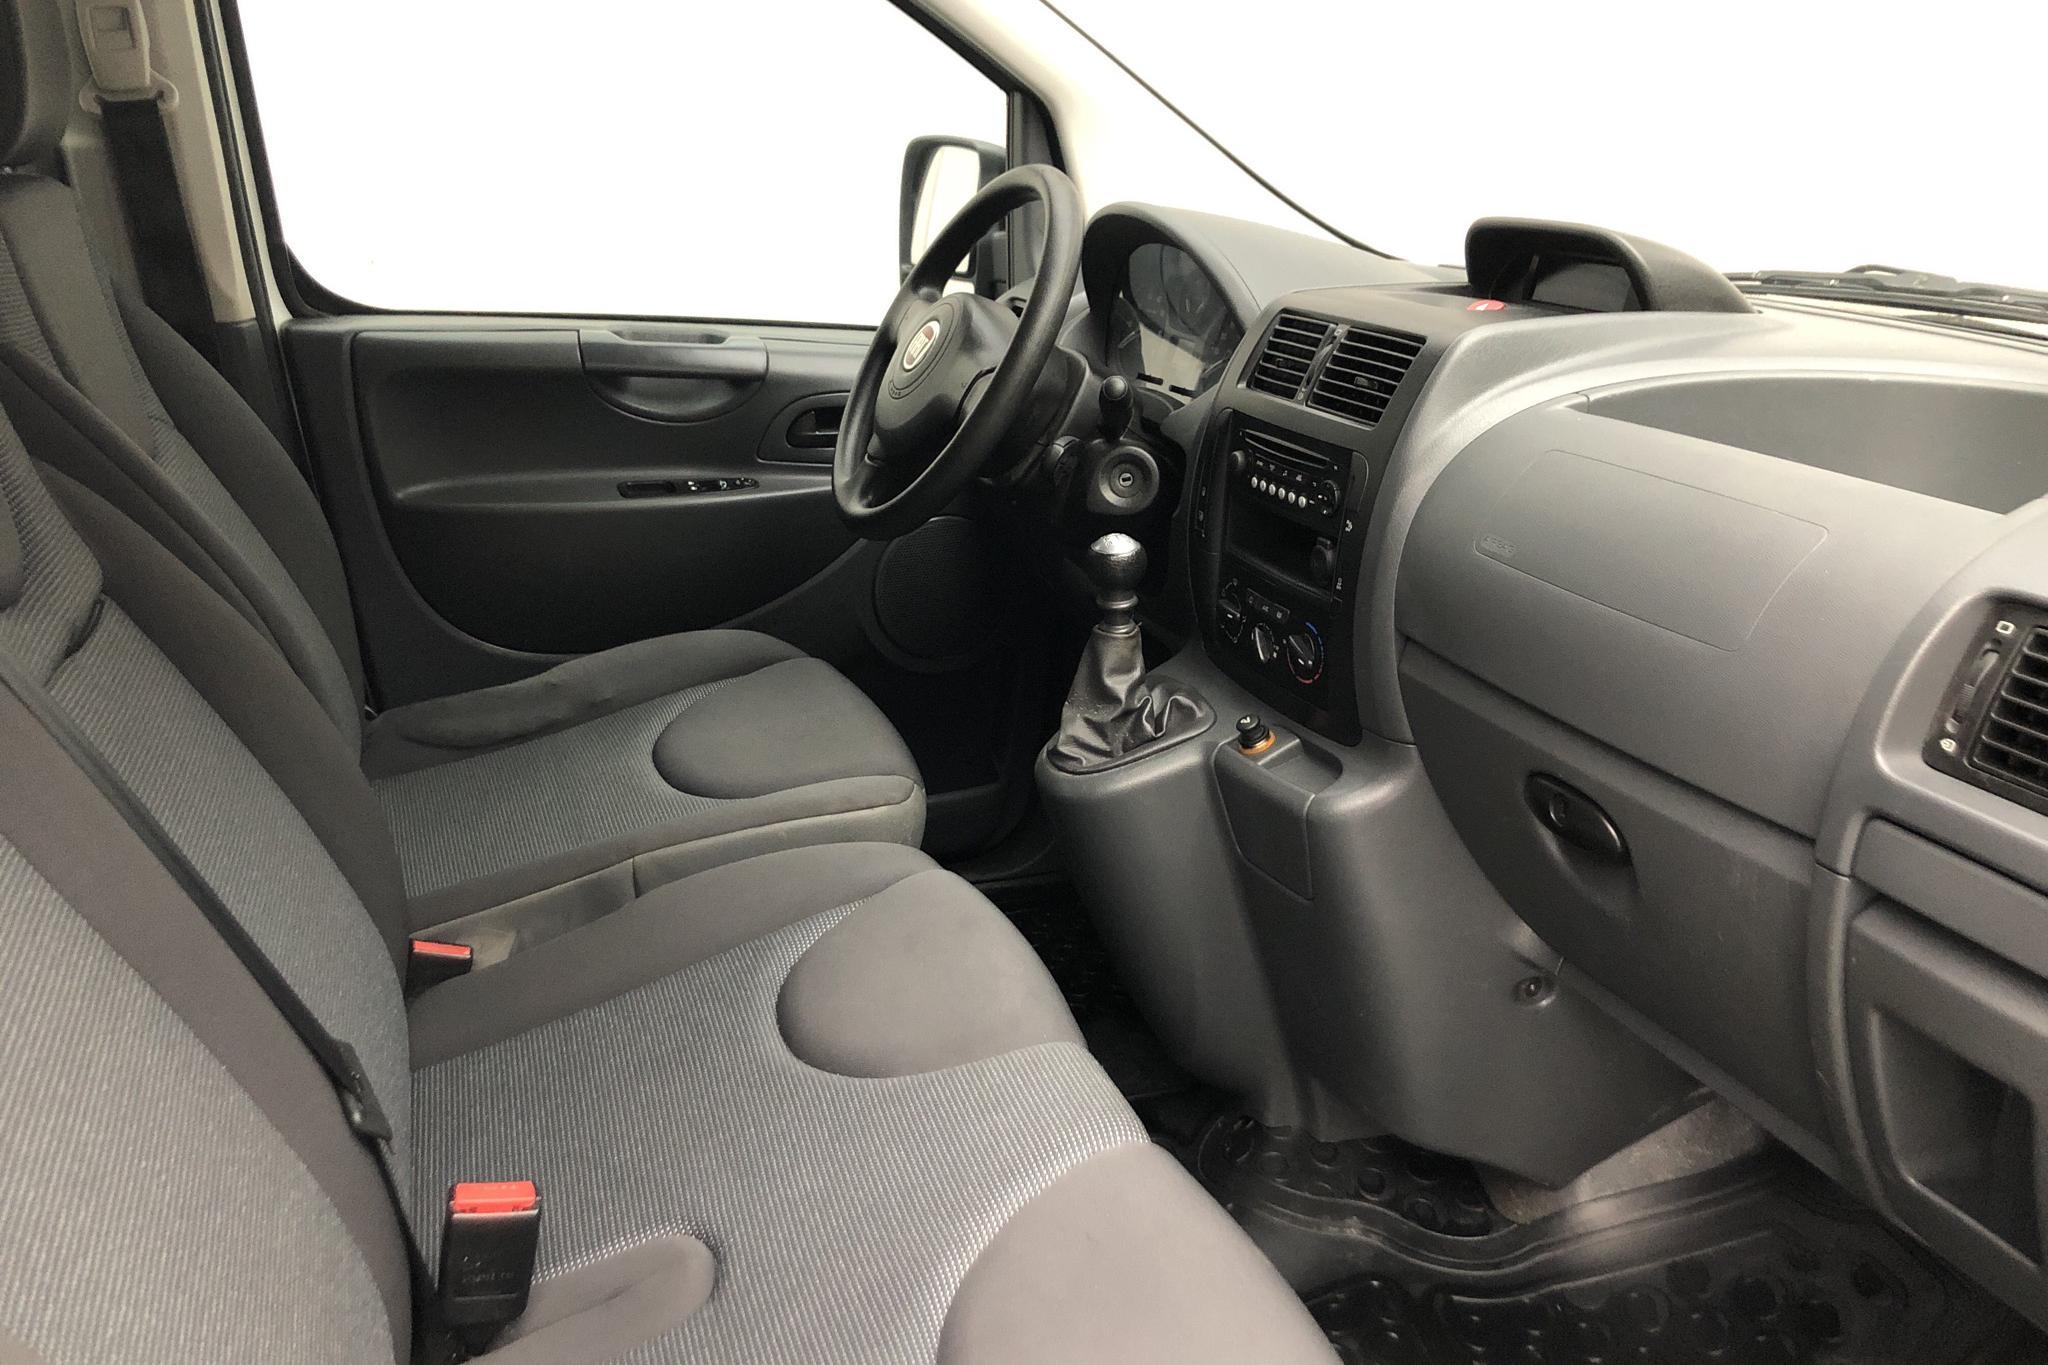 Fiat Scudo 2.0 MJT (130hk) - 100 750 km - Manual - white - 2016